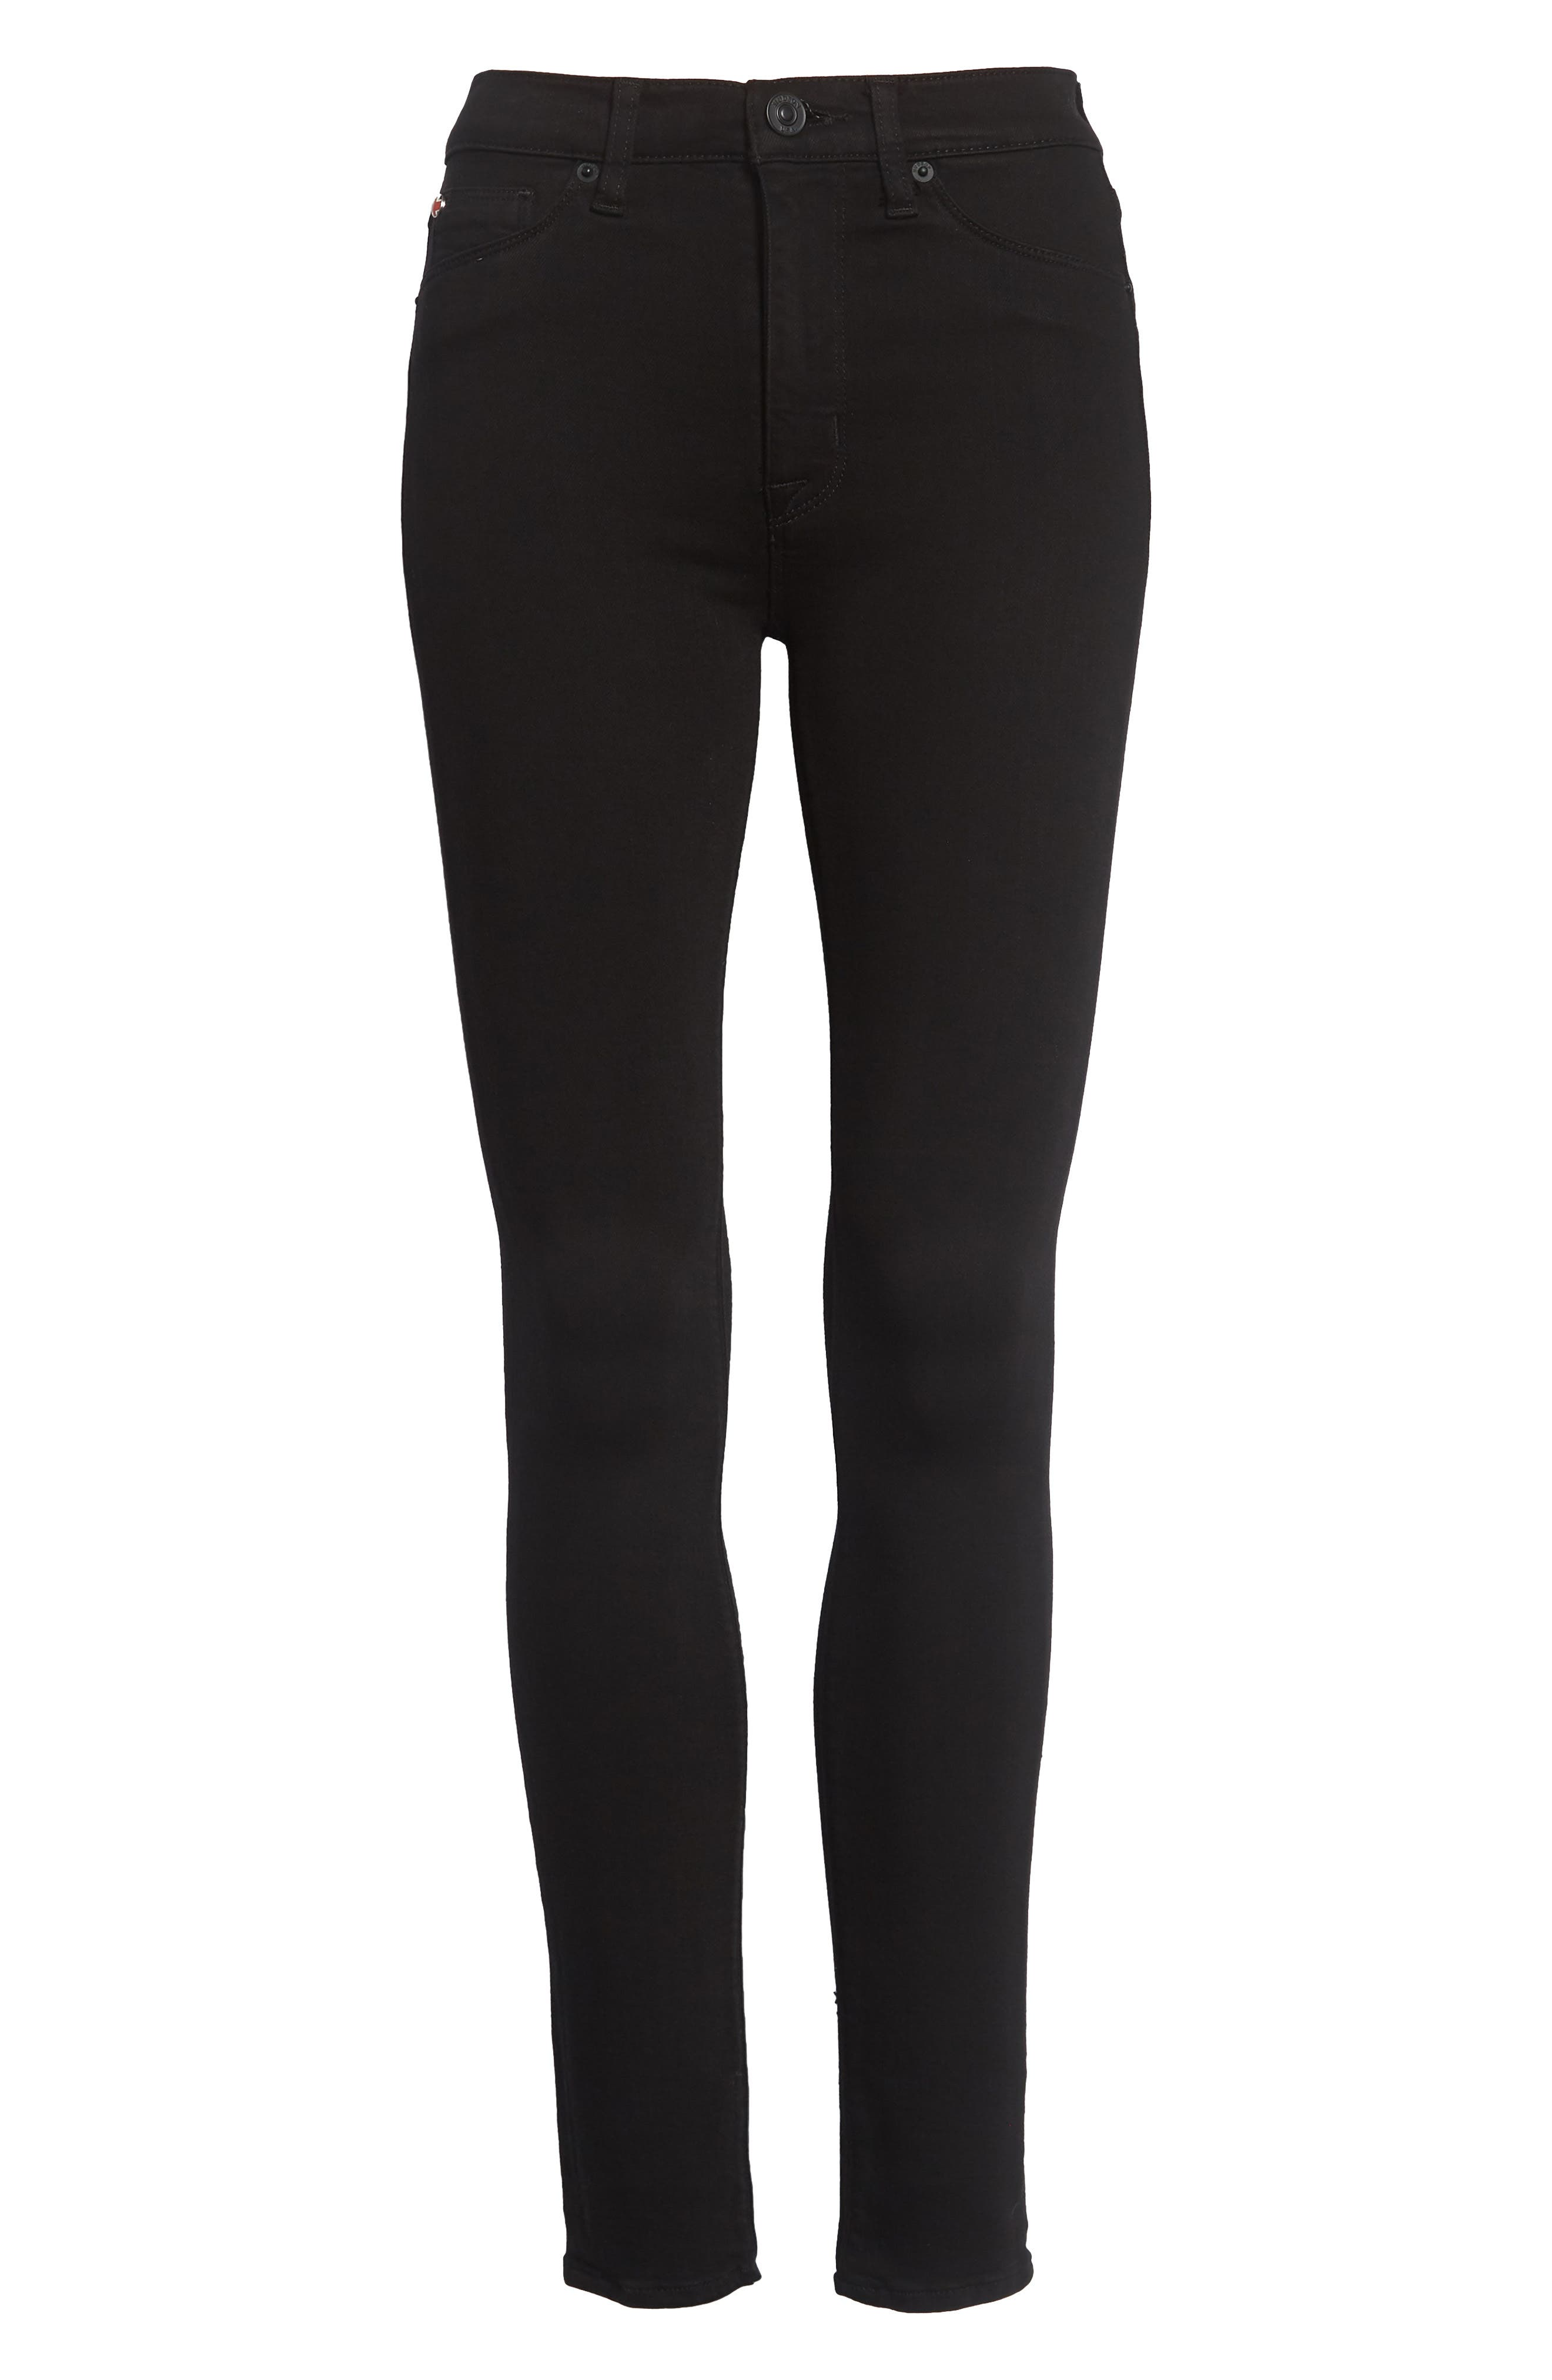 Barbara High Waist Skinny Jeans,                             Alternate thumbnail 4, color,                             Black